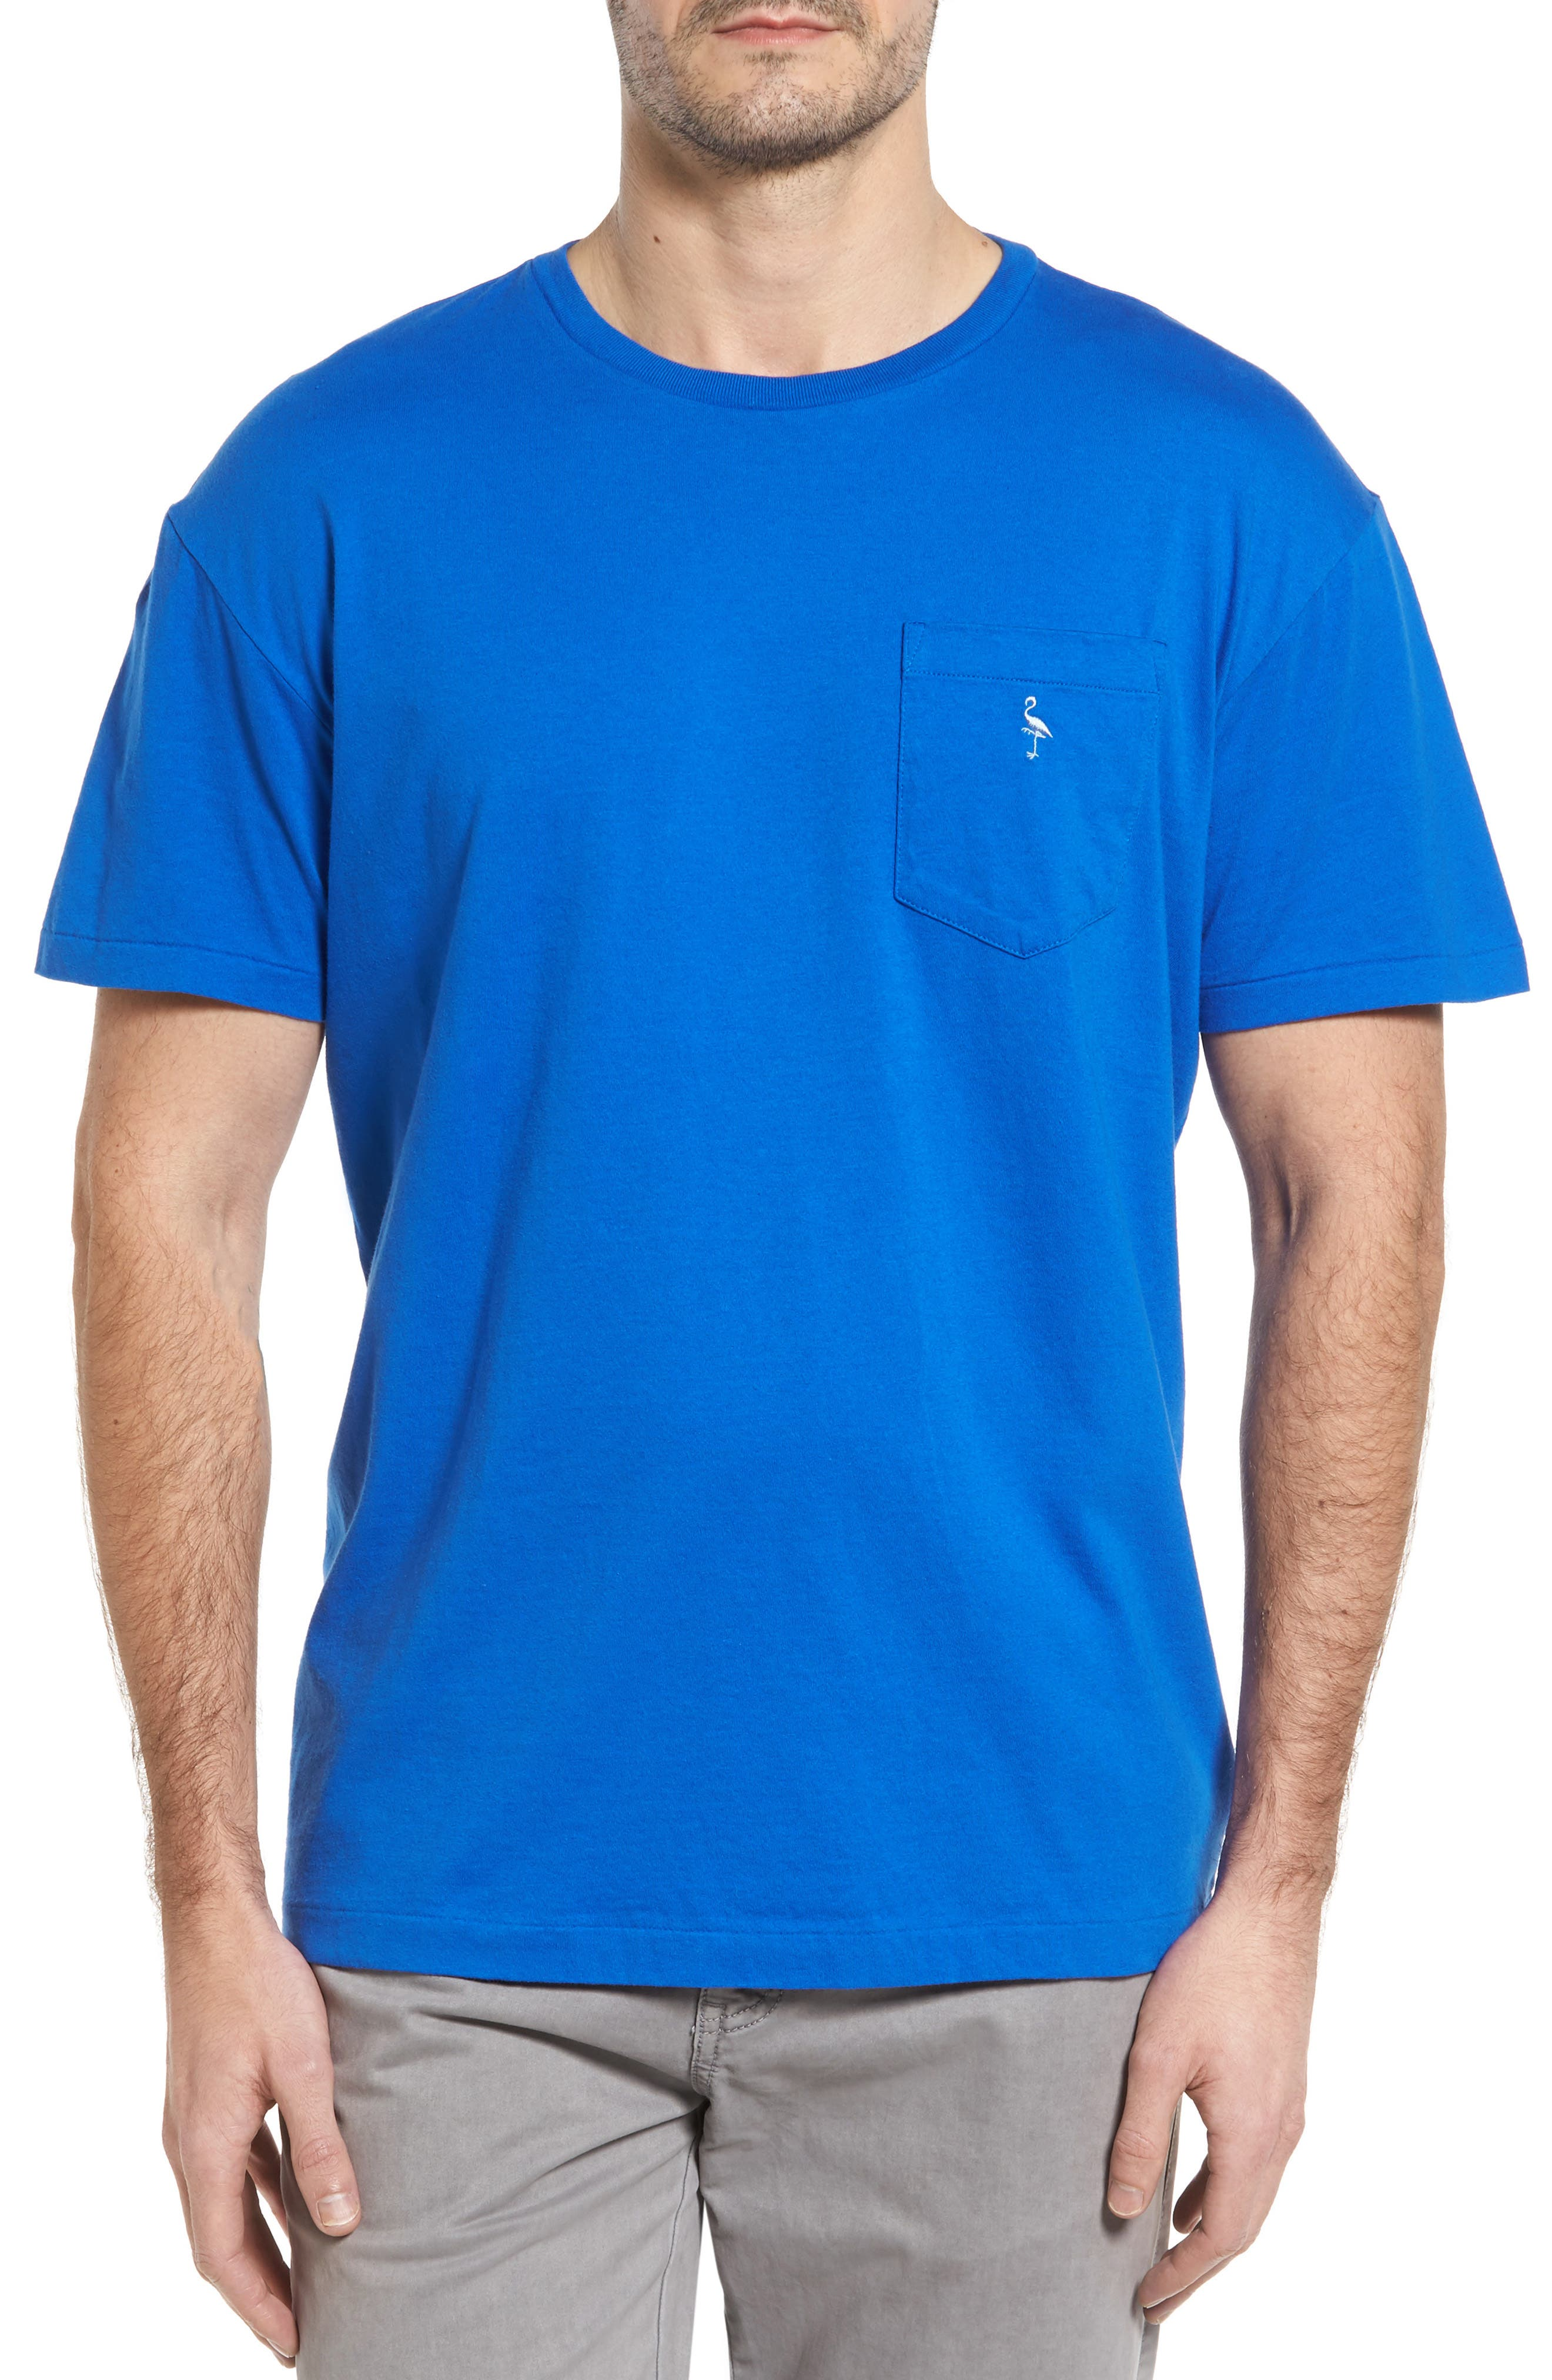 TailorByrd Crewneck T-Shirt